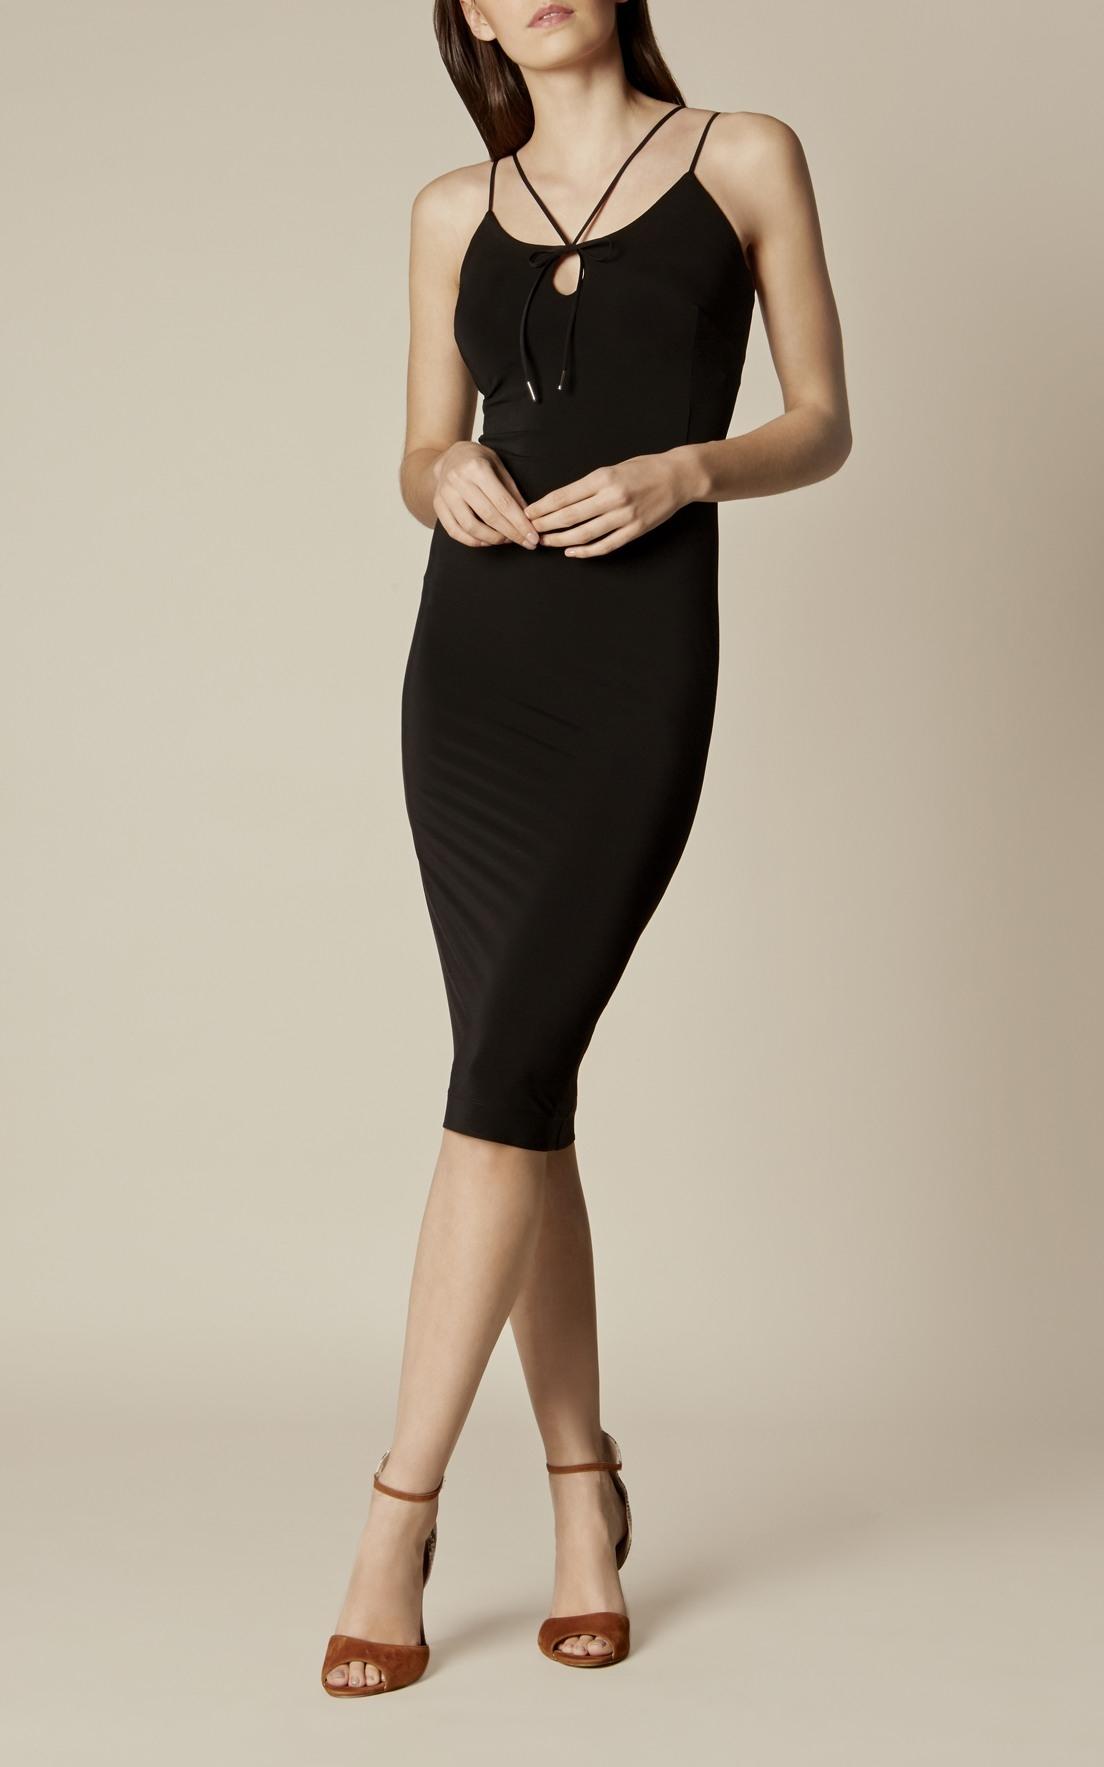 Abend Genial Kleid Eng Stylish15 Elegant Kleid Eng Vertrieb